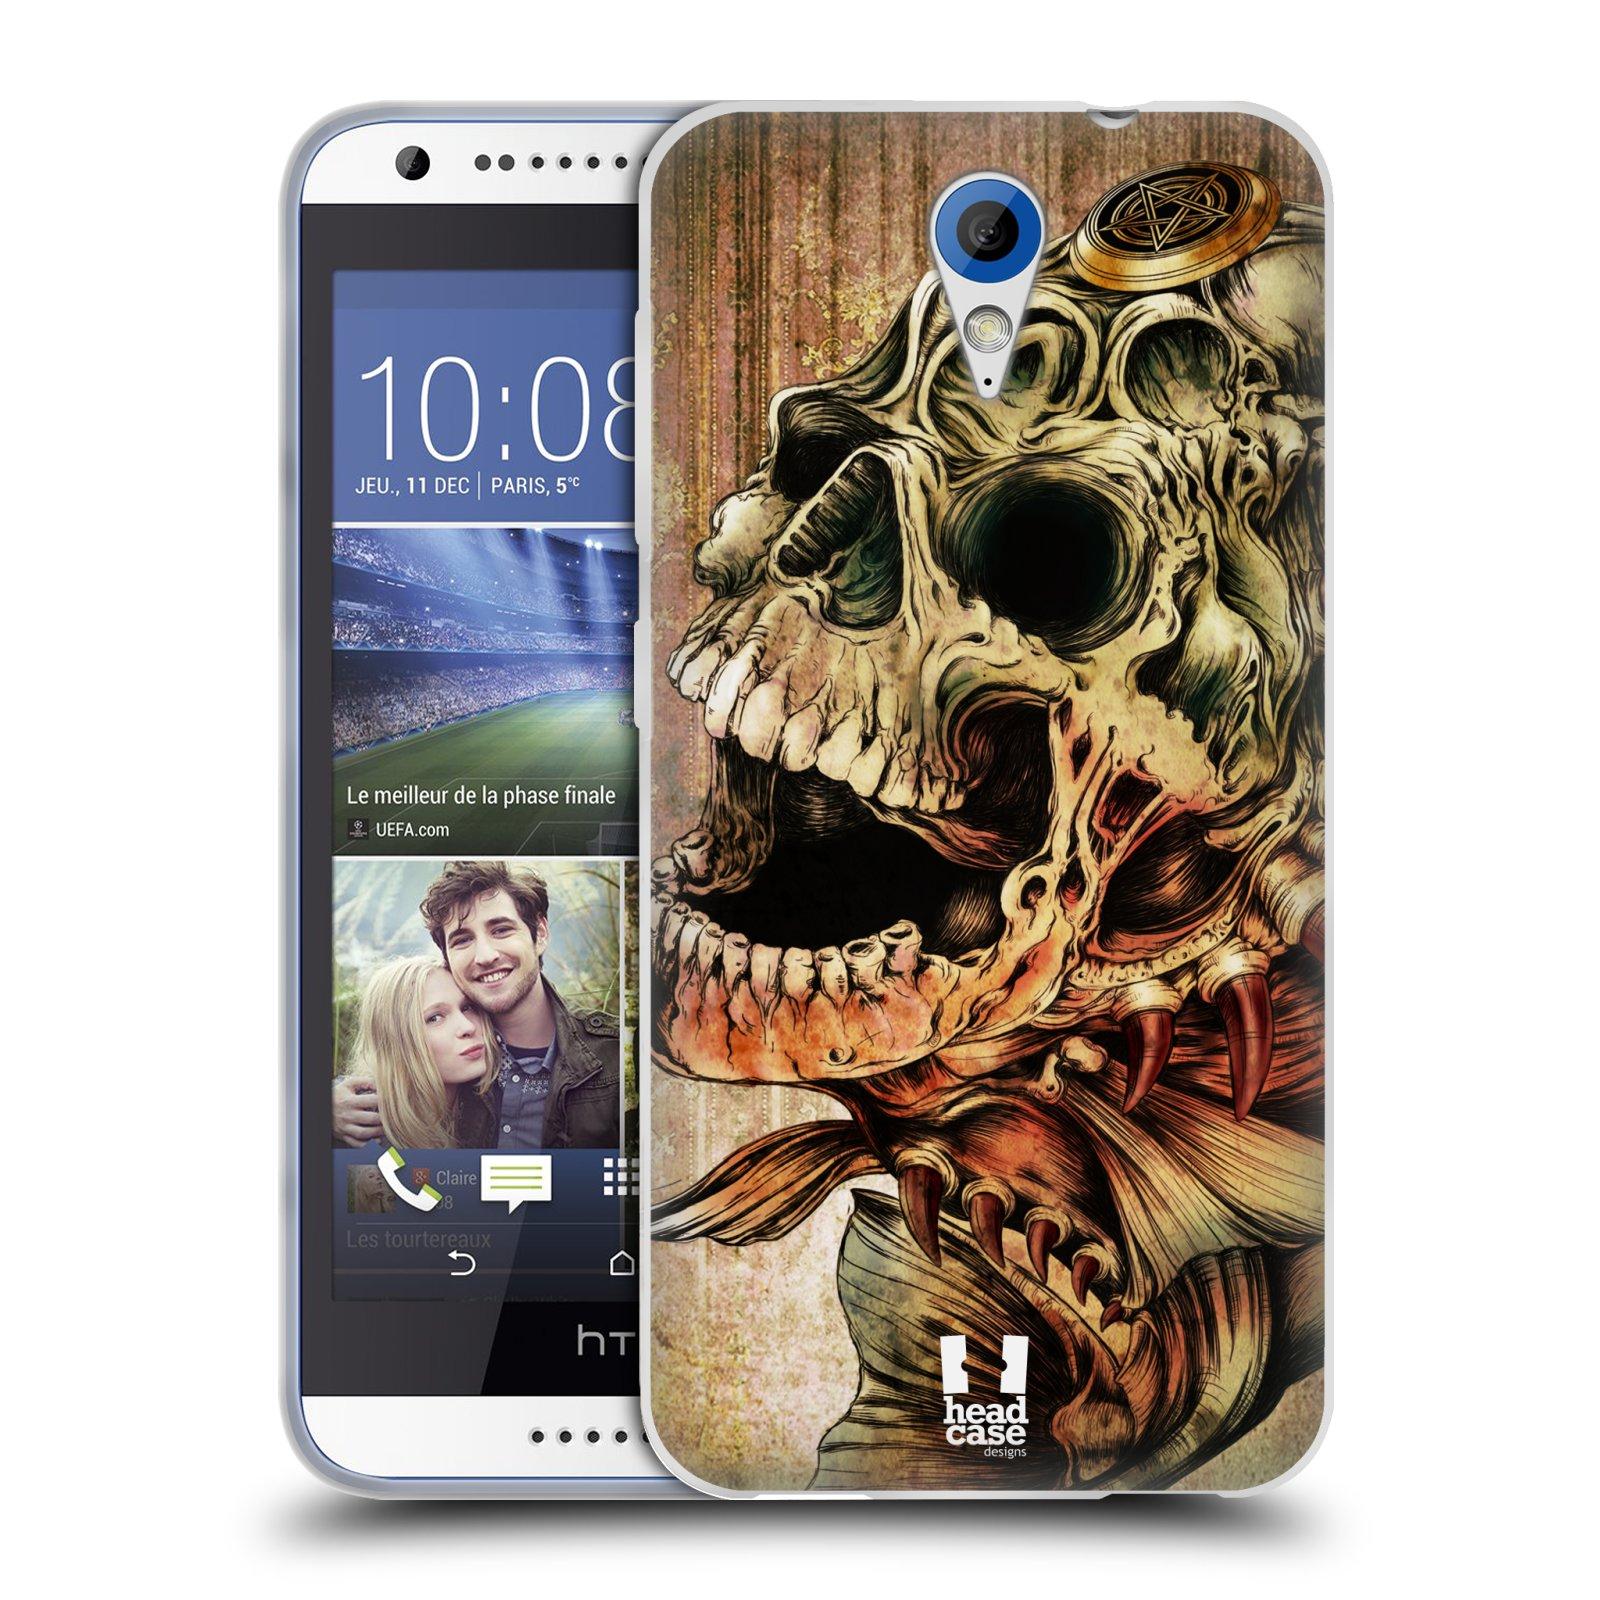 Silikonové pouzdro na mobil HTC Desire 620 HEAD CASE PIRANHA (Silikonový kryt či obal na mobilní telefon HTC Desire 620)